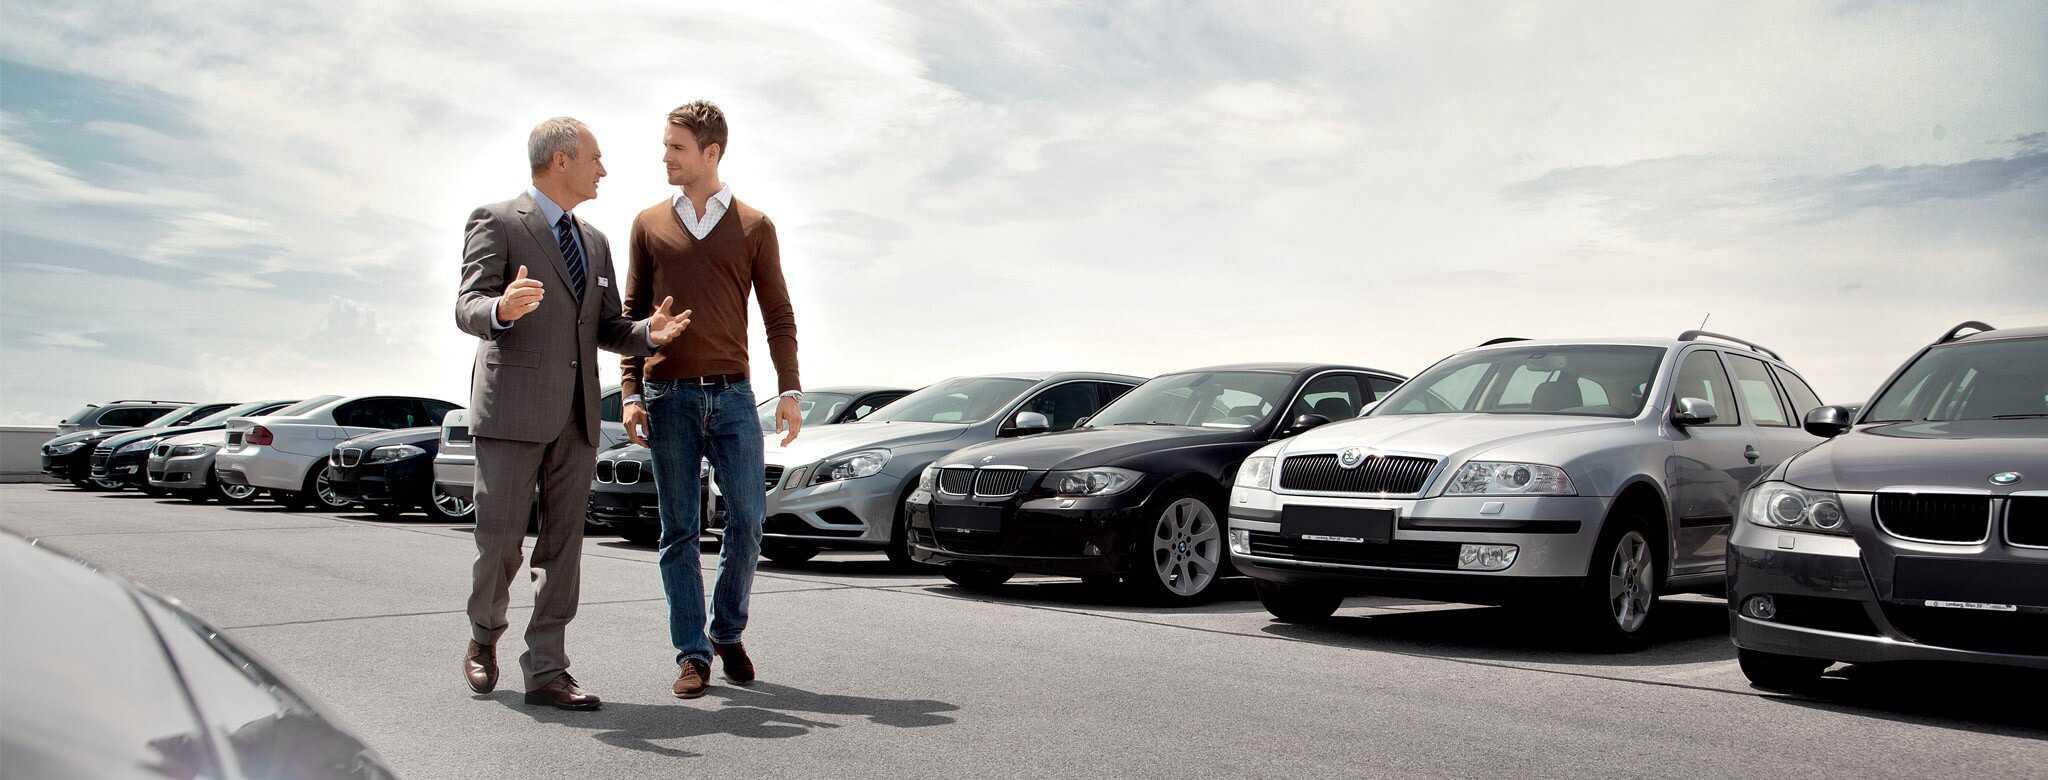 company vehicle fleet